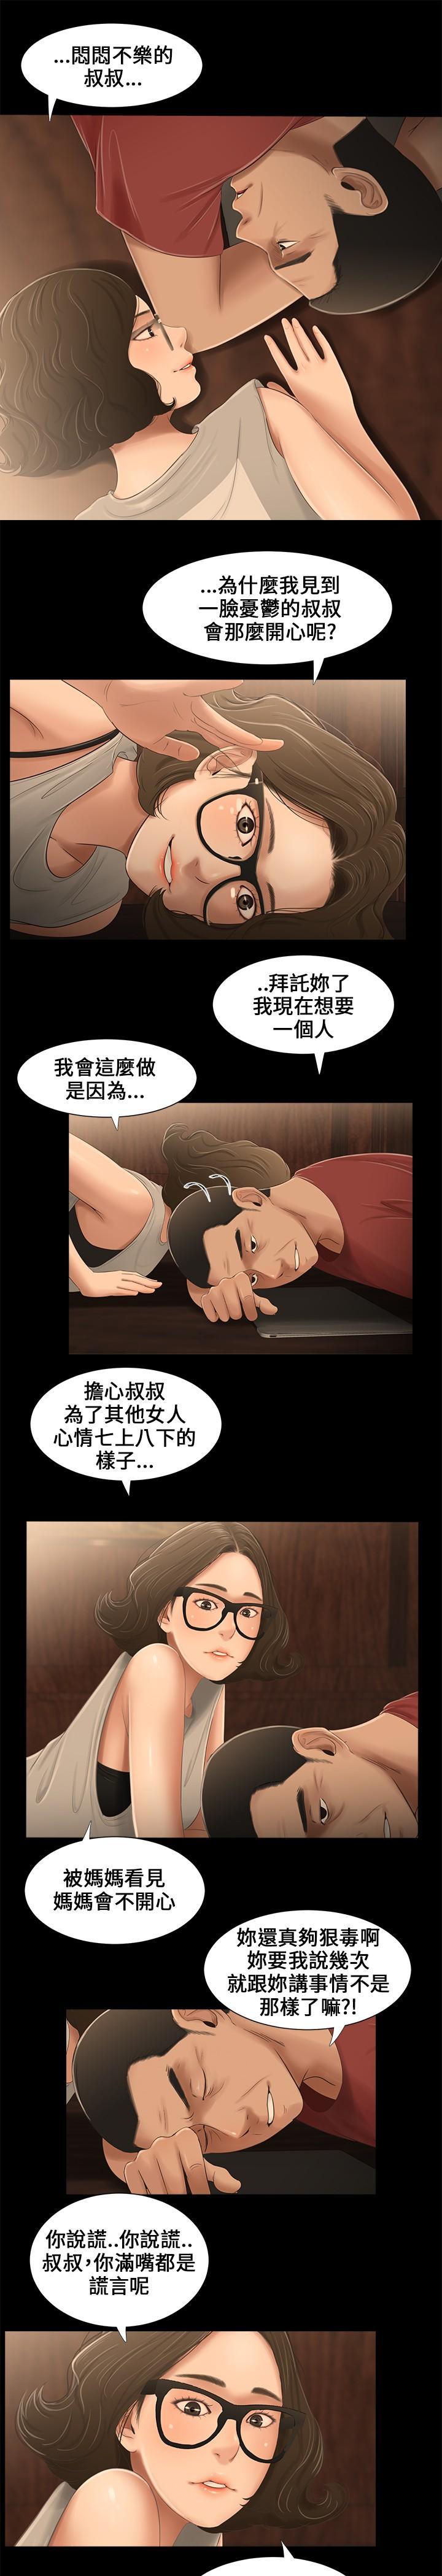 Three sisters 三姐妹Ch.13~19 (Chinese)中文 7